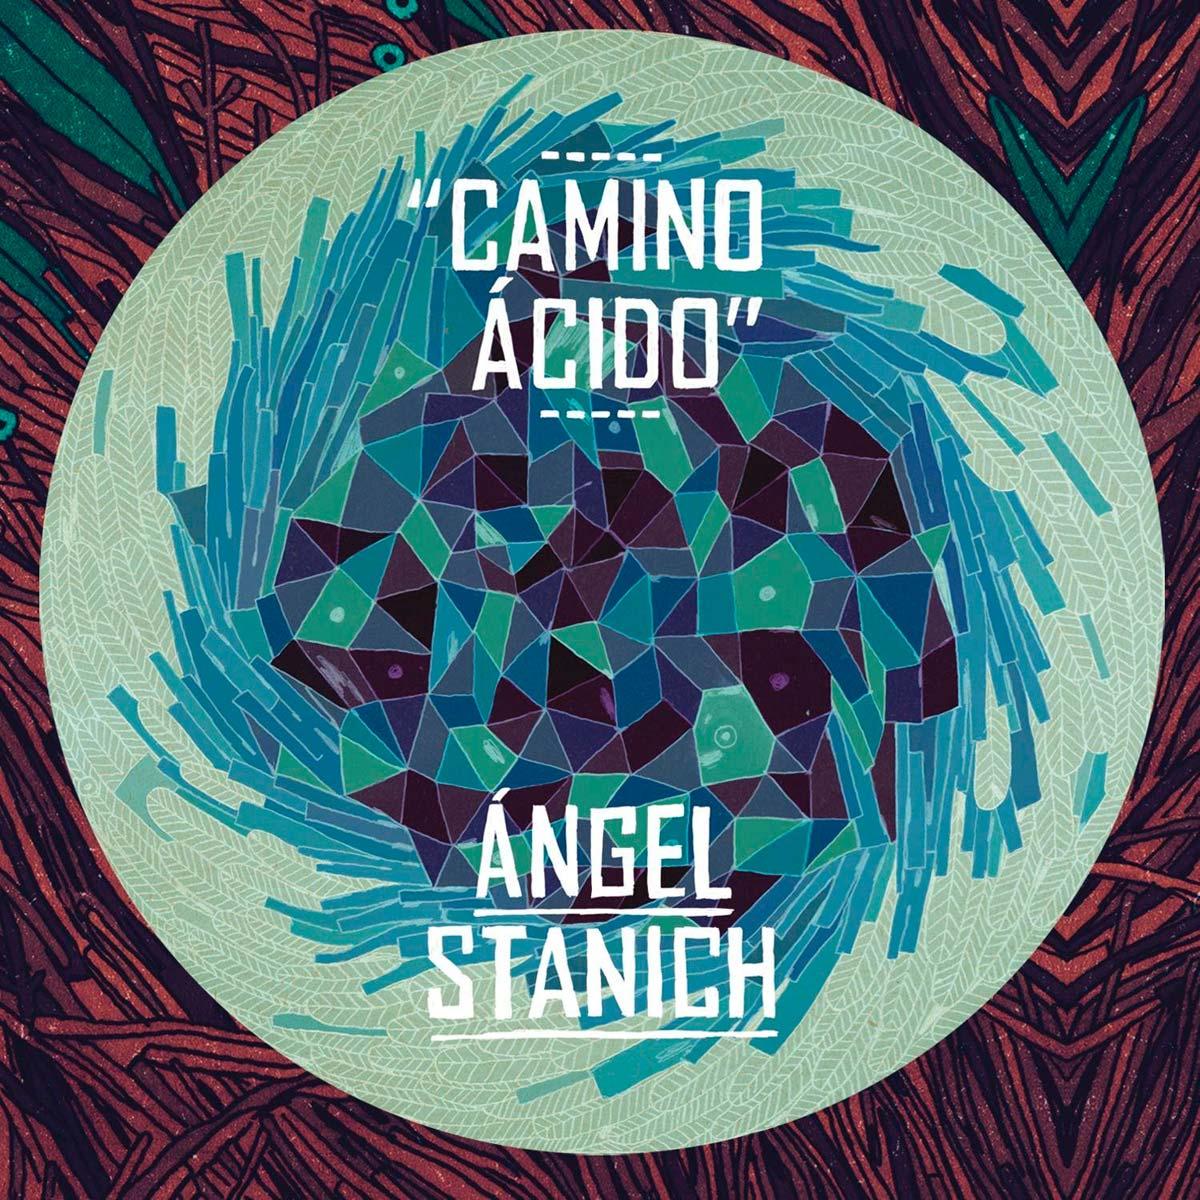 Camino Ácido de Ángel Stanich